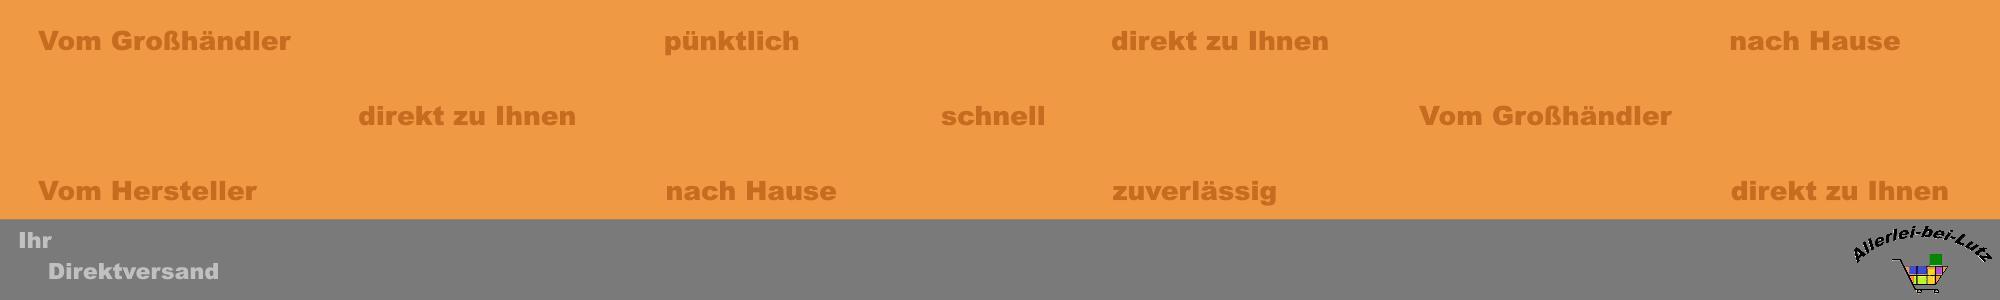 Allerlei-bei-Lutz; Direktversand